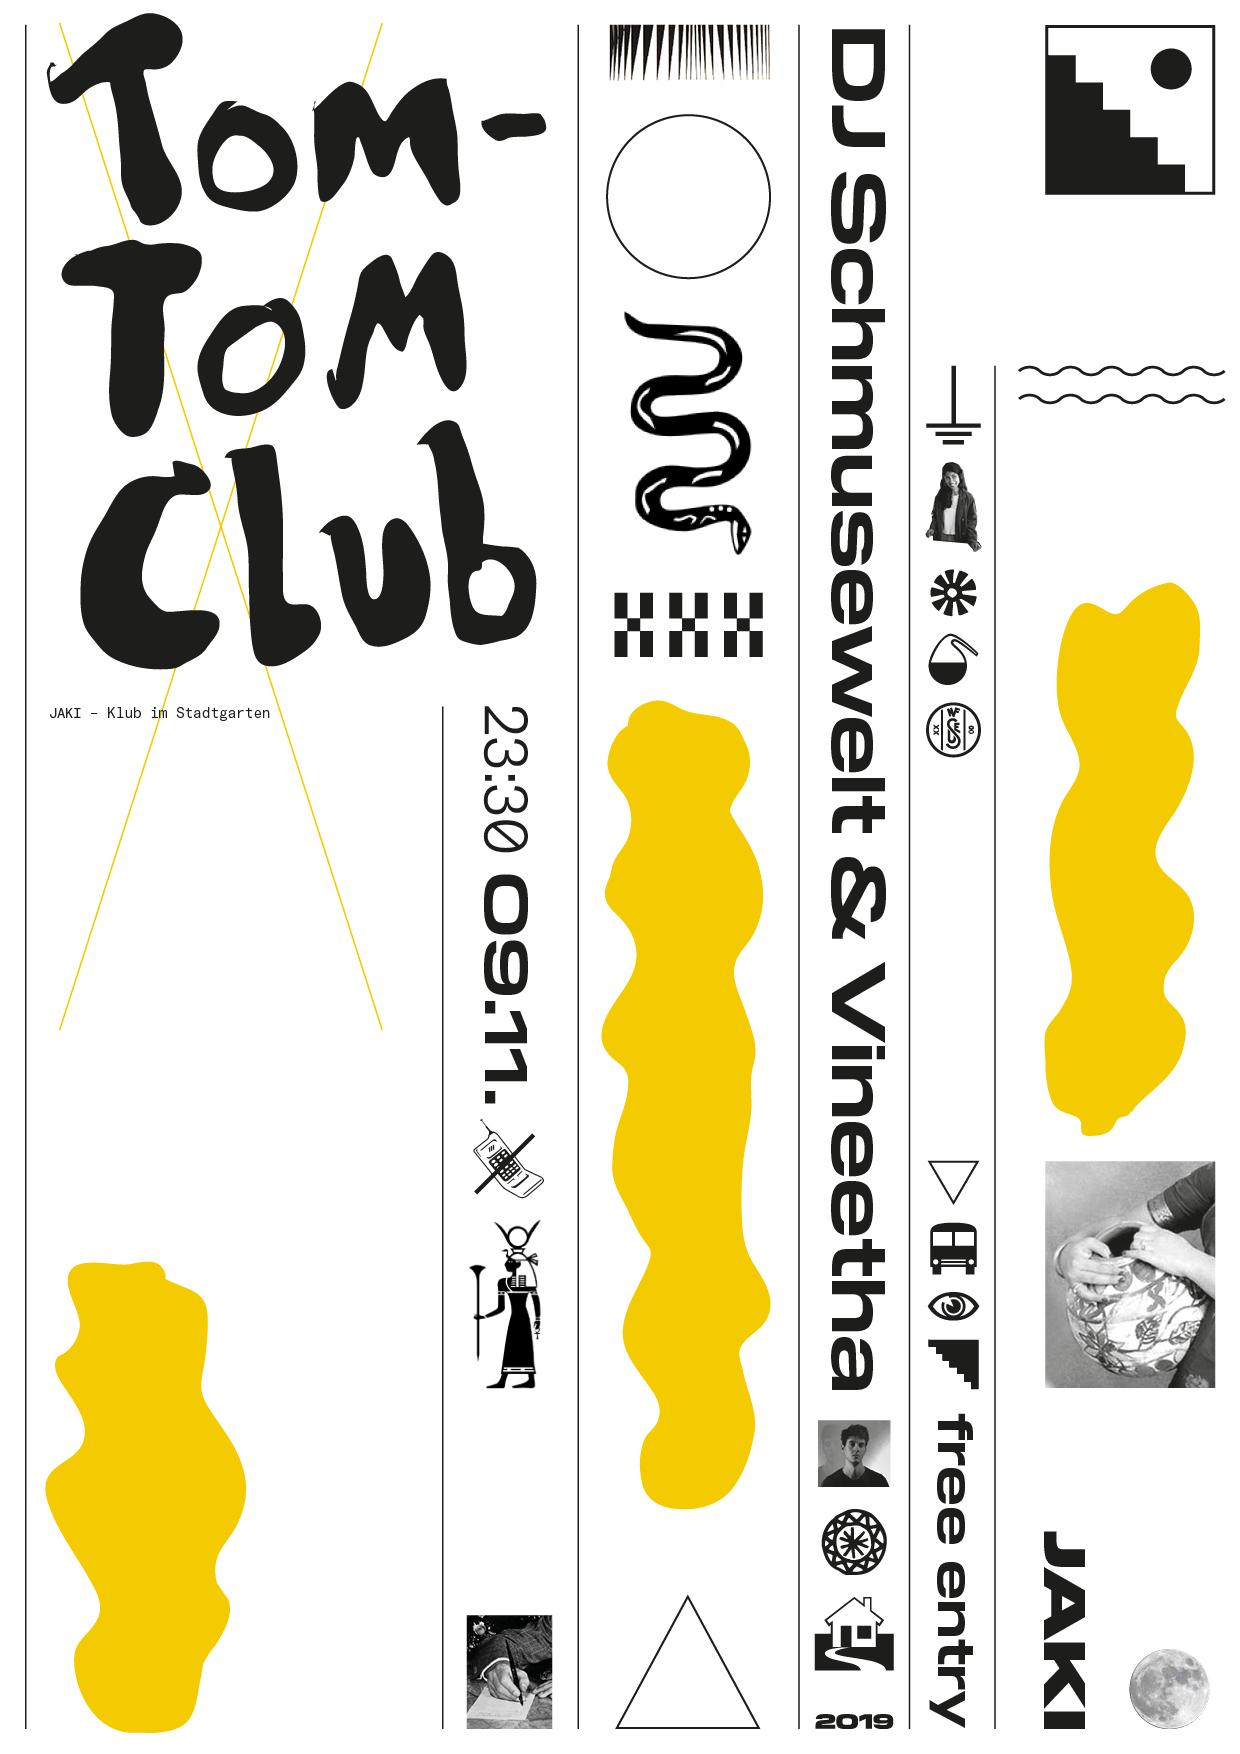 TomTom_1109